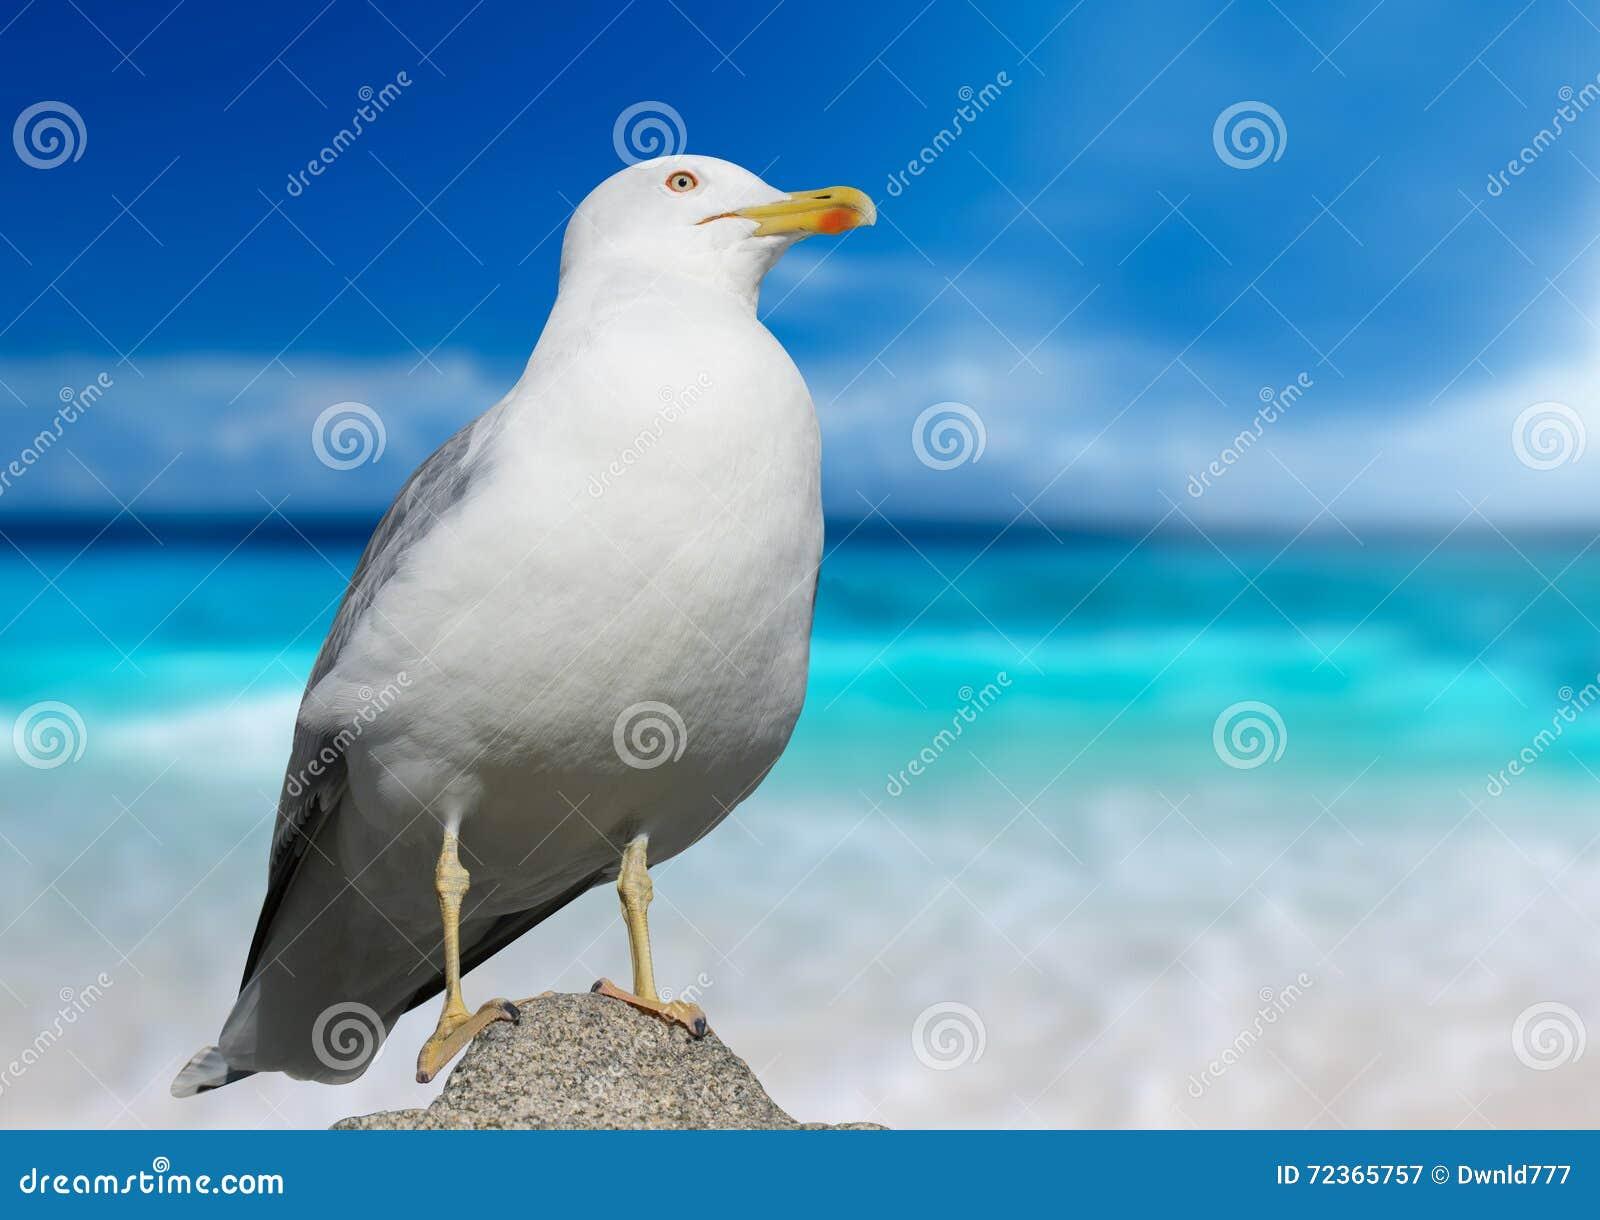 Christi特写镜头语科库拍摄了海鸥南得克萨斯美国